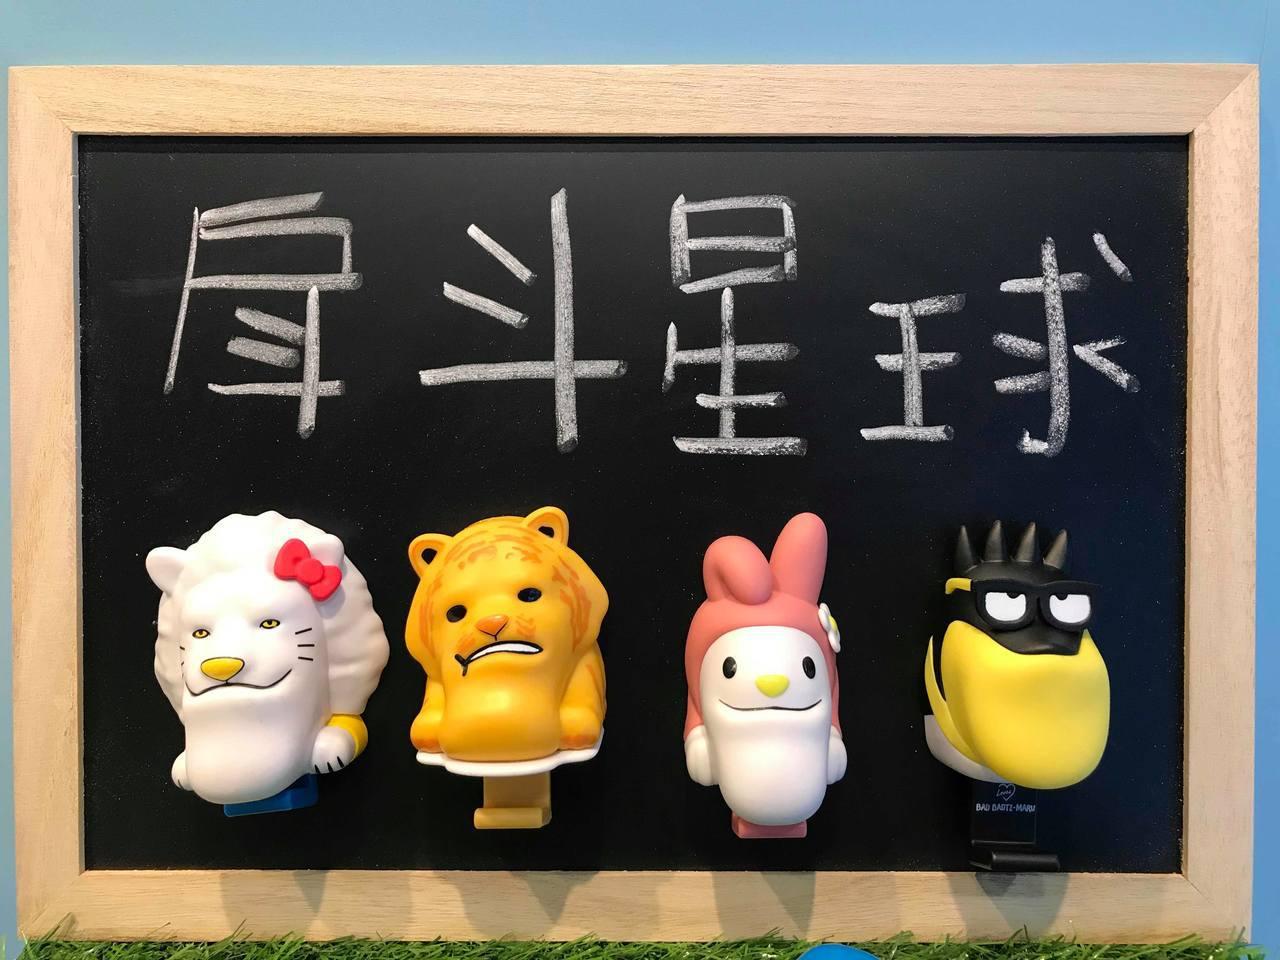 7-ELEVEN「三麗鷗X戽斗星球」CITY CAFE集點活動9月25日開跑,立...